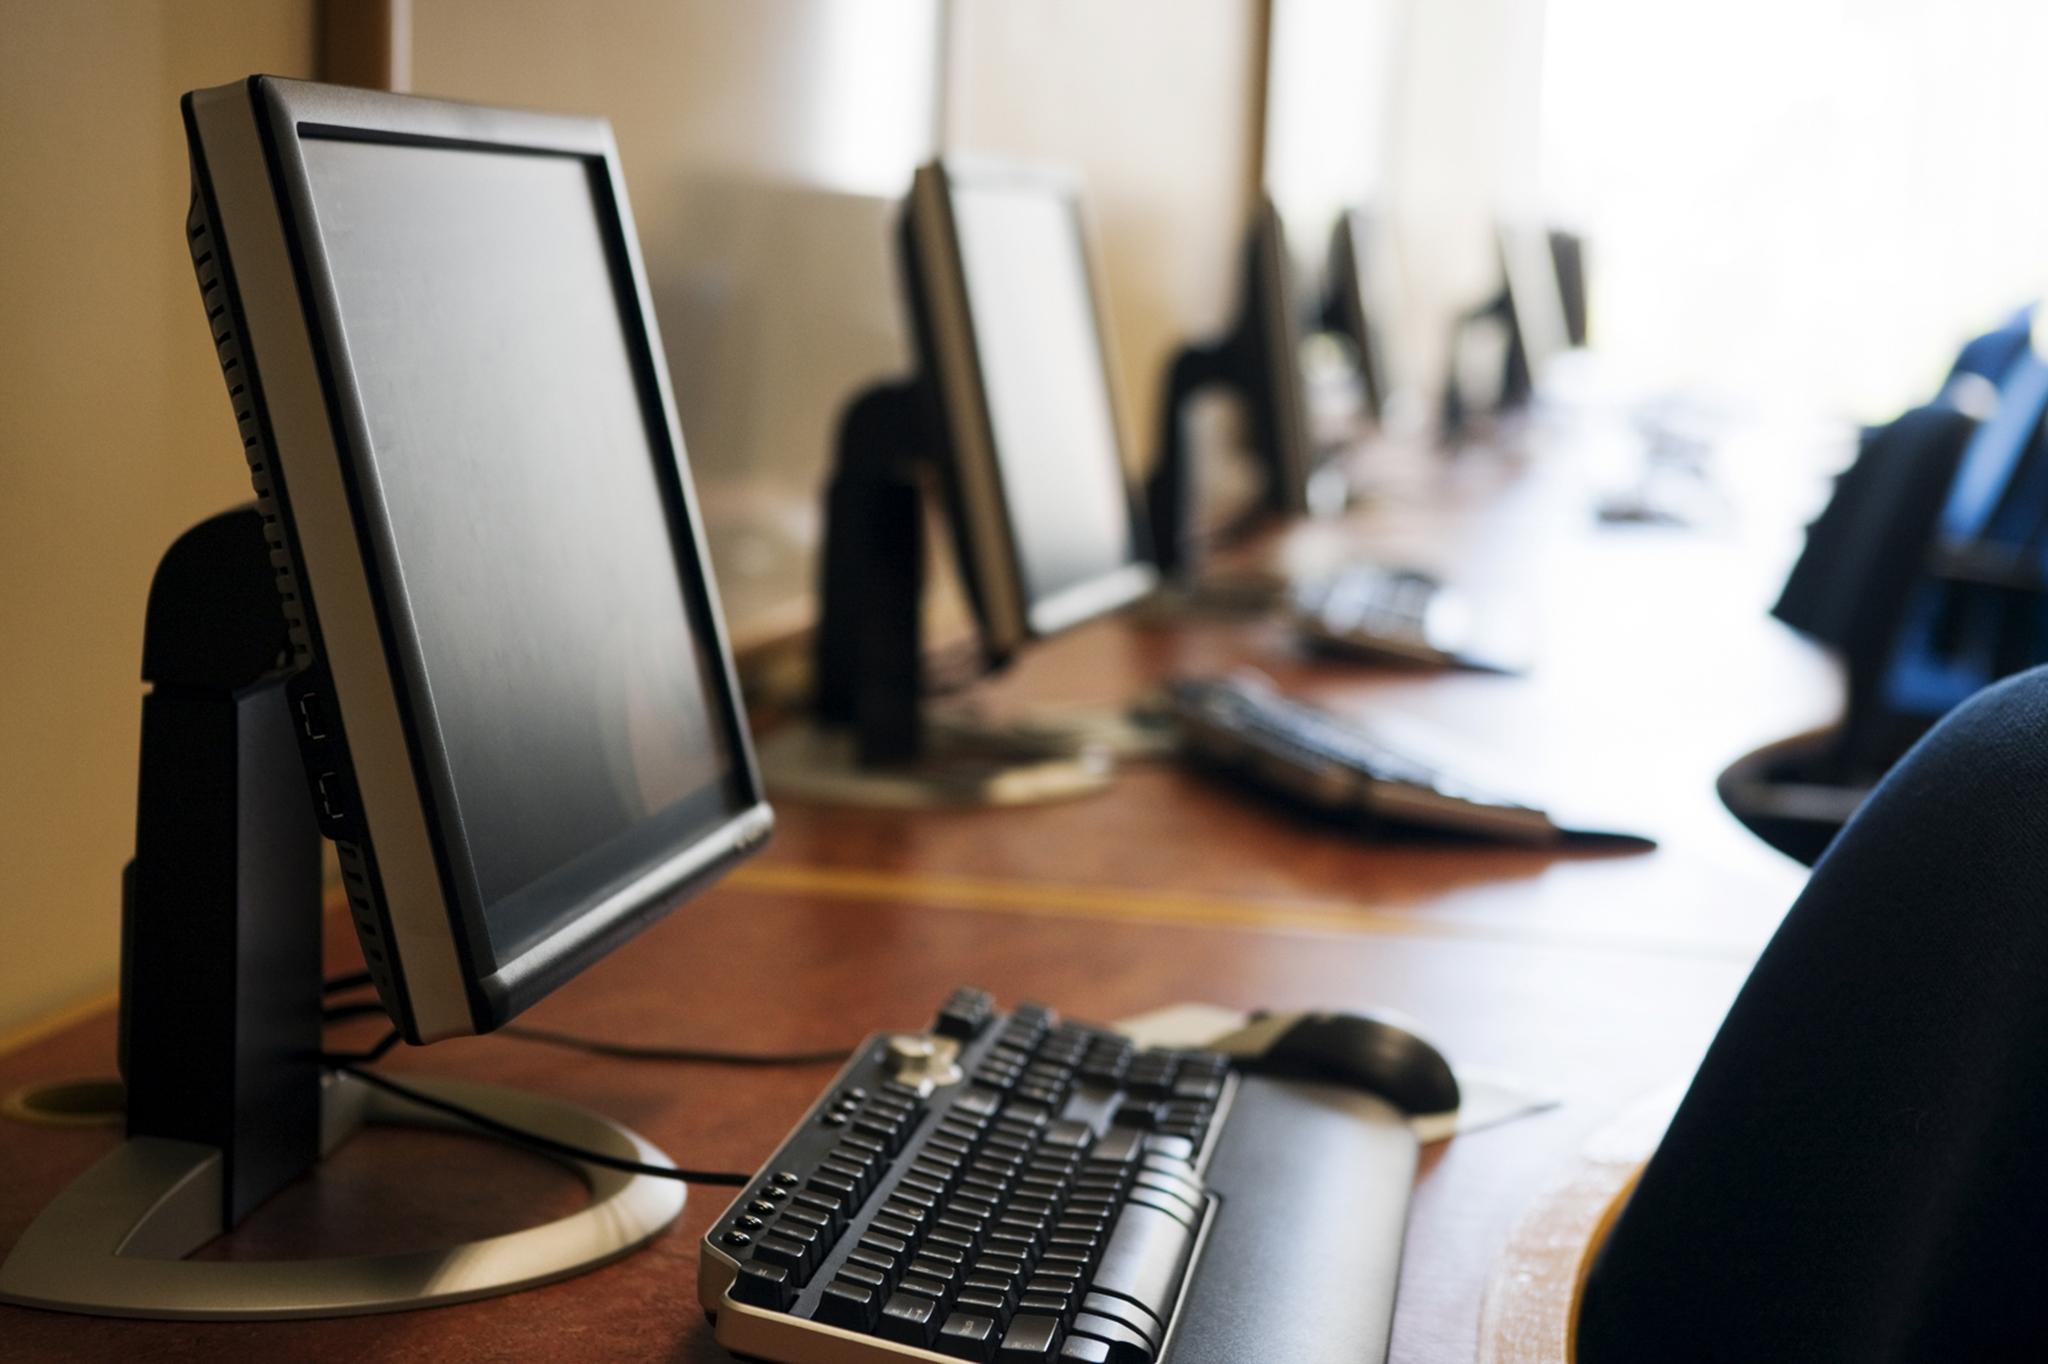 Auditoria | SAFP contribuíram para atraso do Governo Electrónico